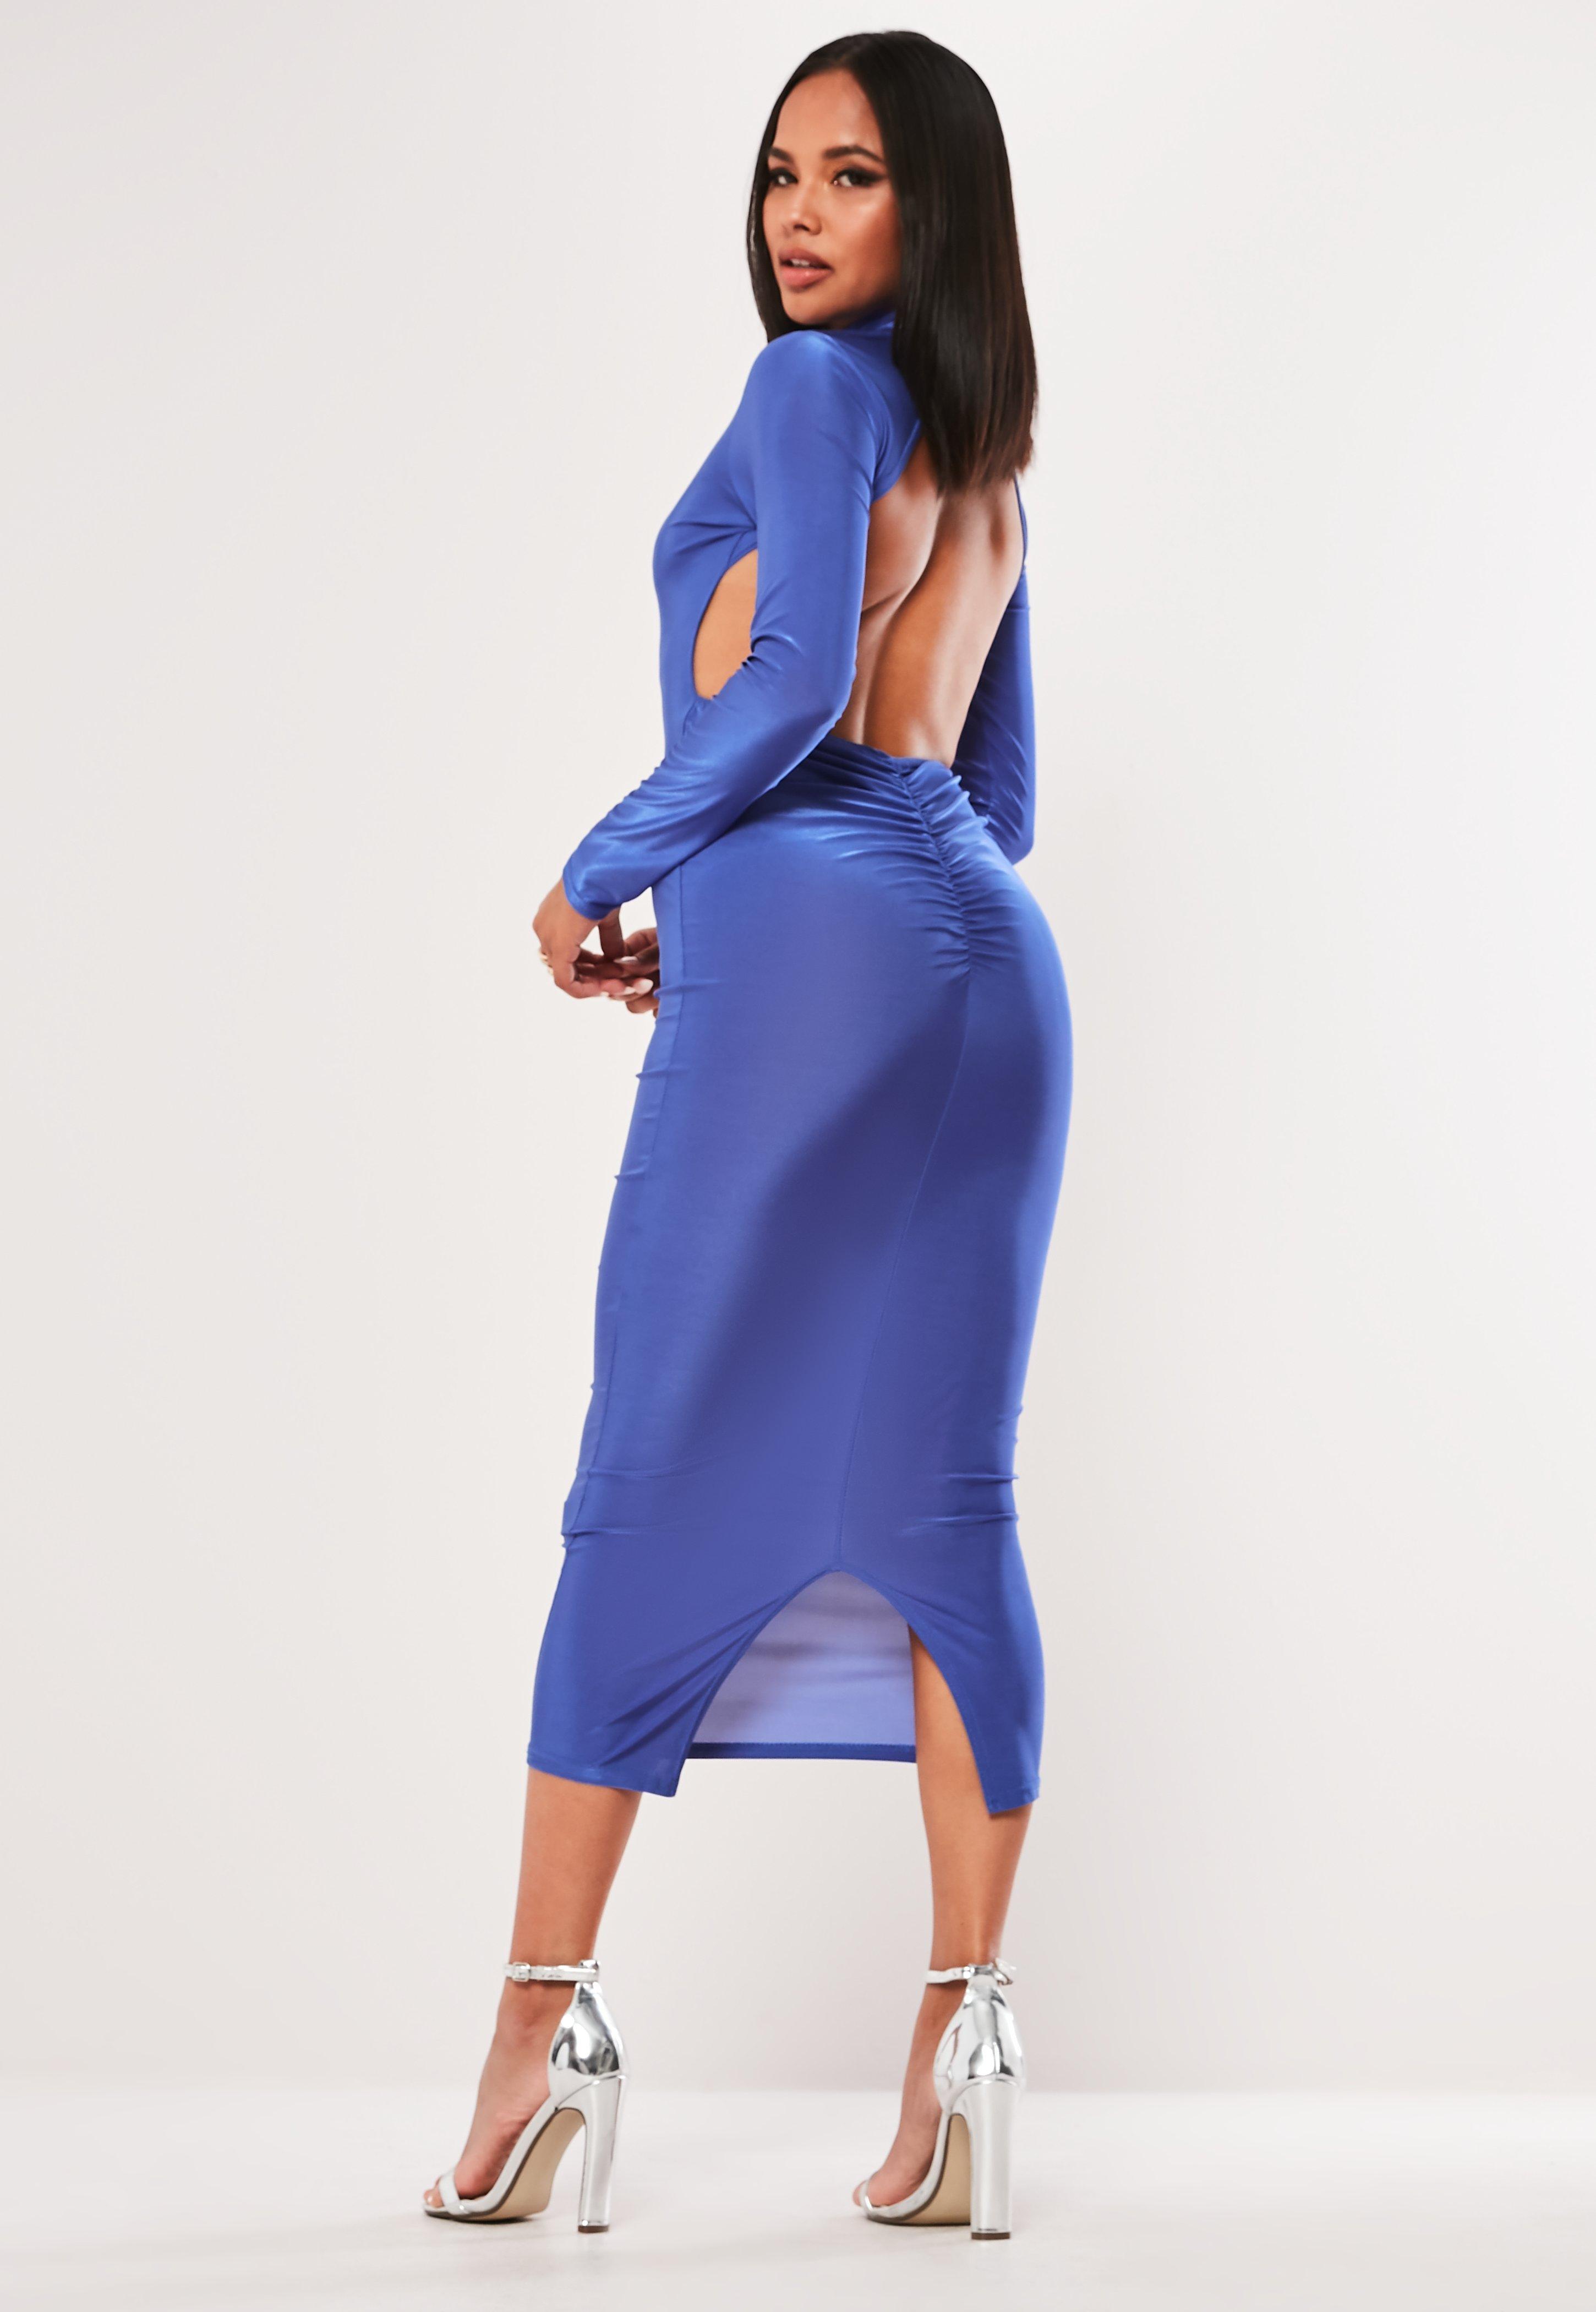 Blaues kleid lippenstift